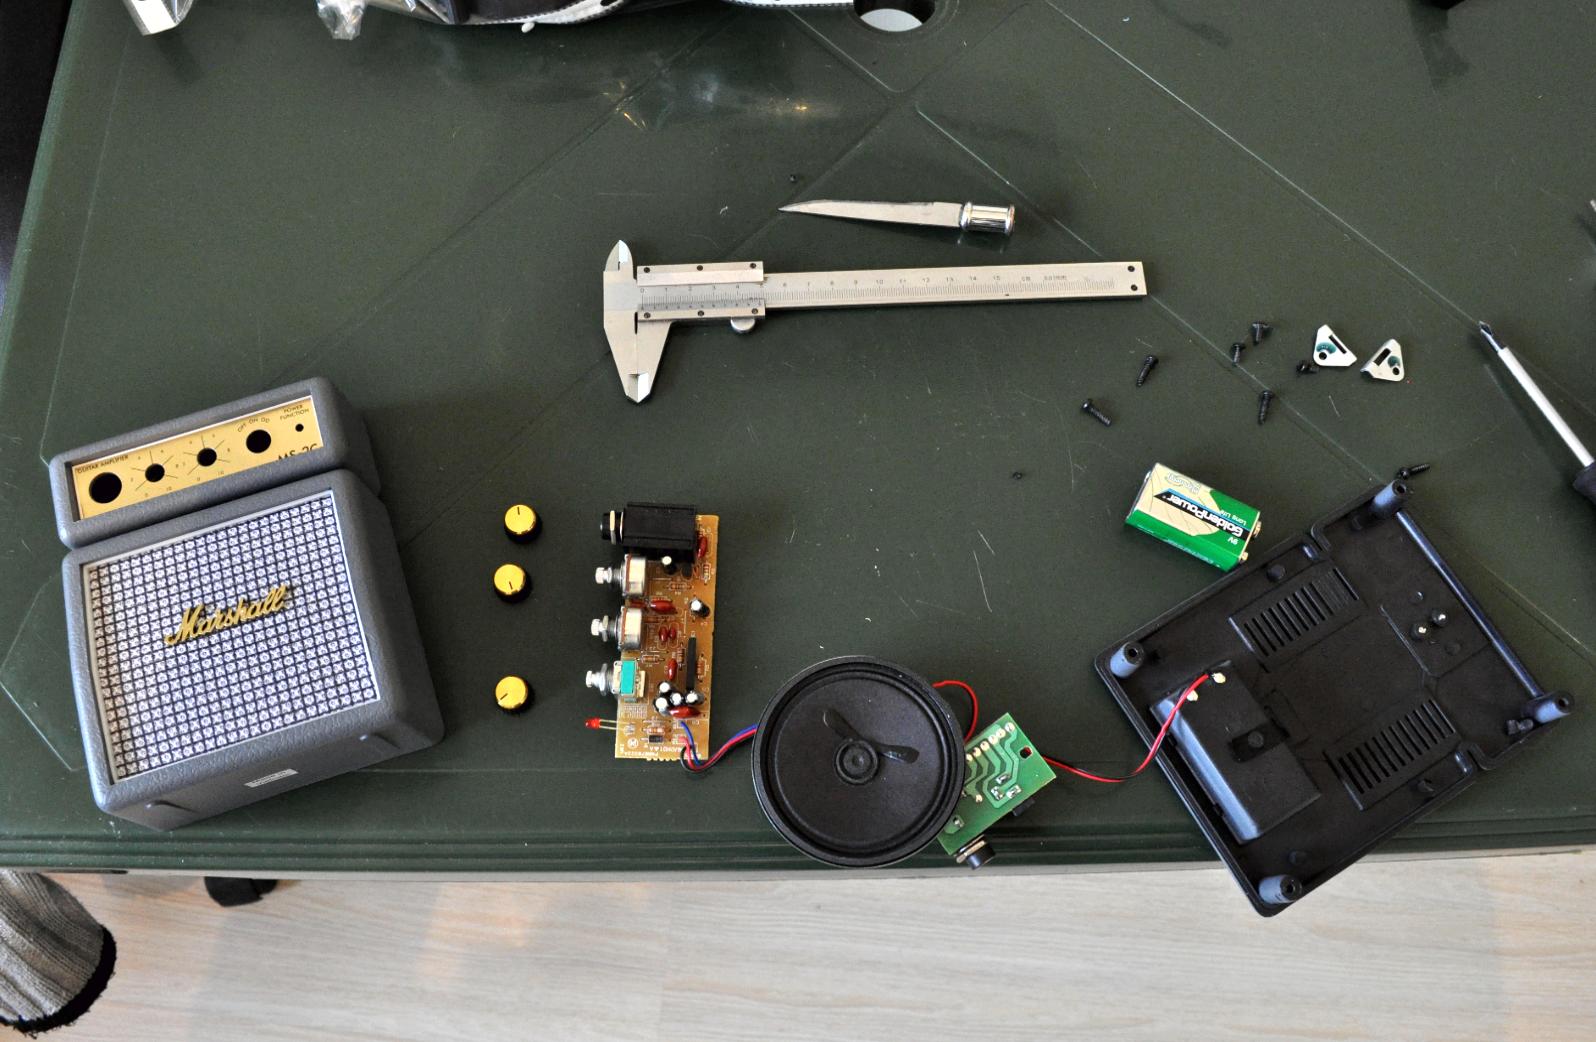 3.png Download free STL file Guitar with built in Amp and Speaker • 3D printable model, CrocodileGene3d